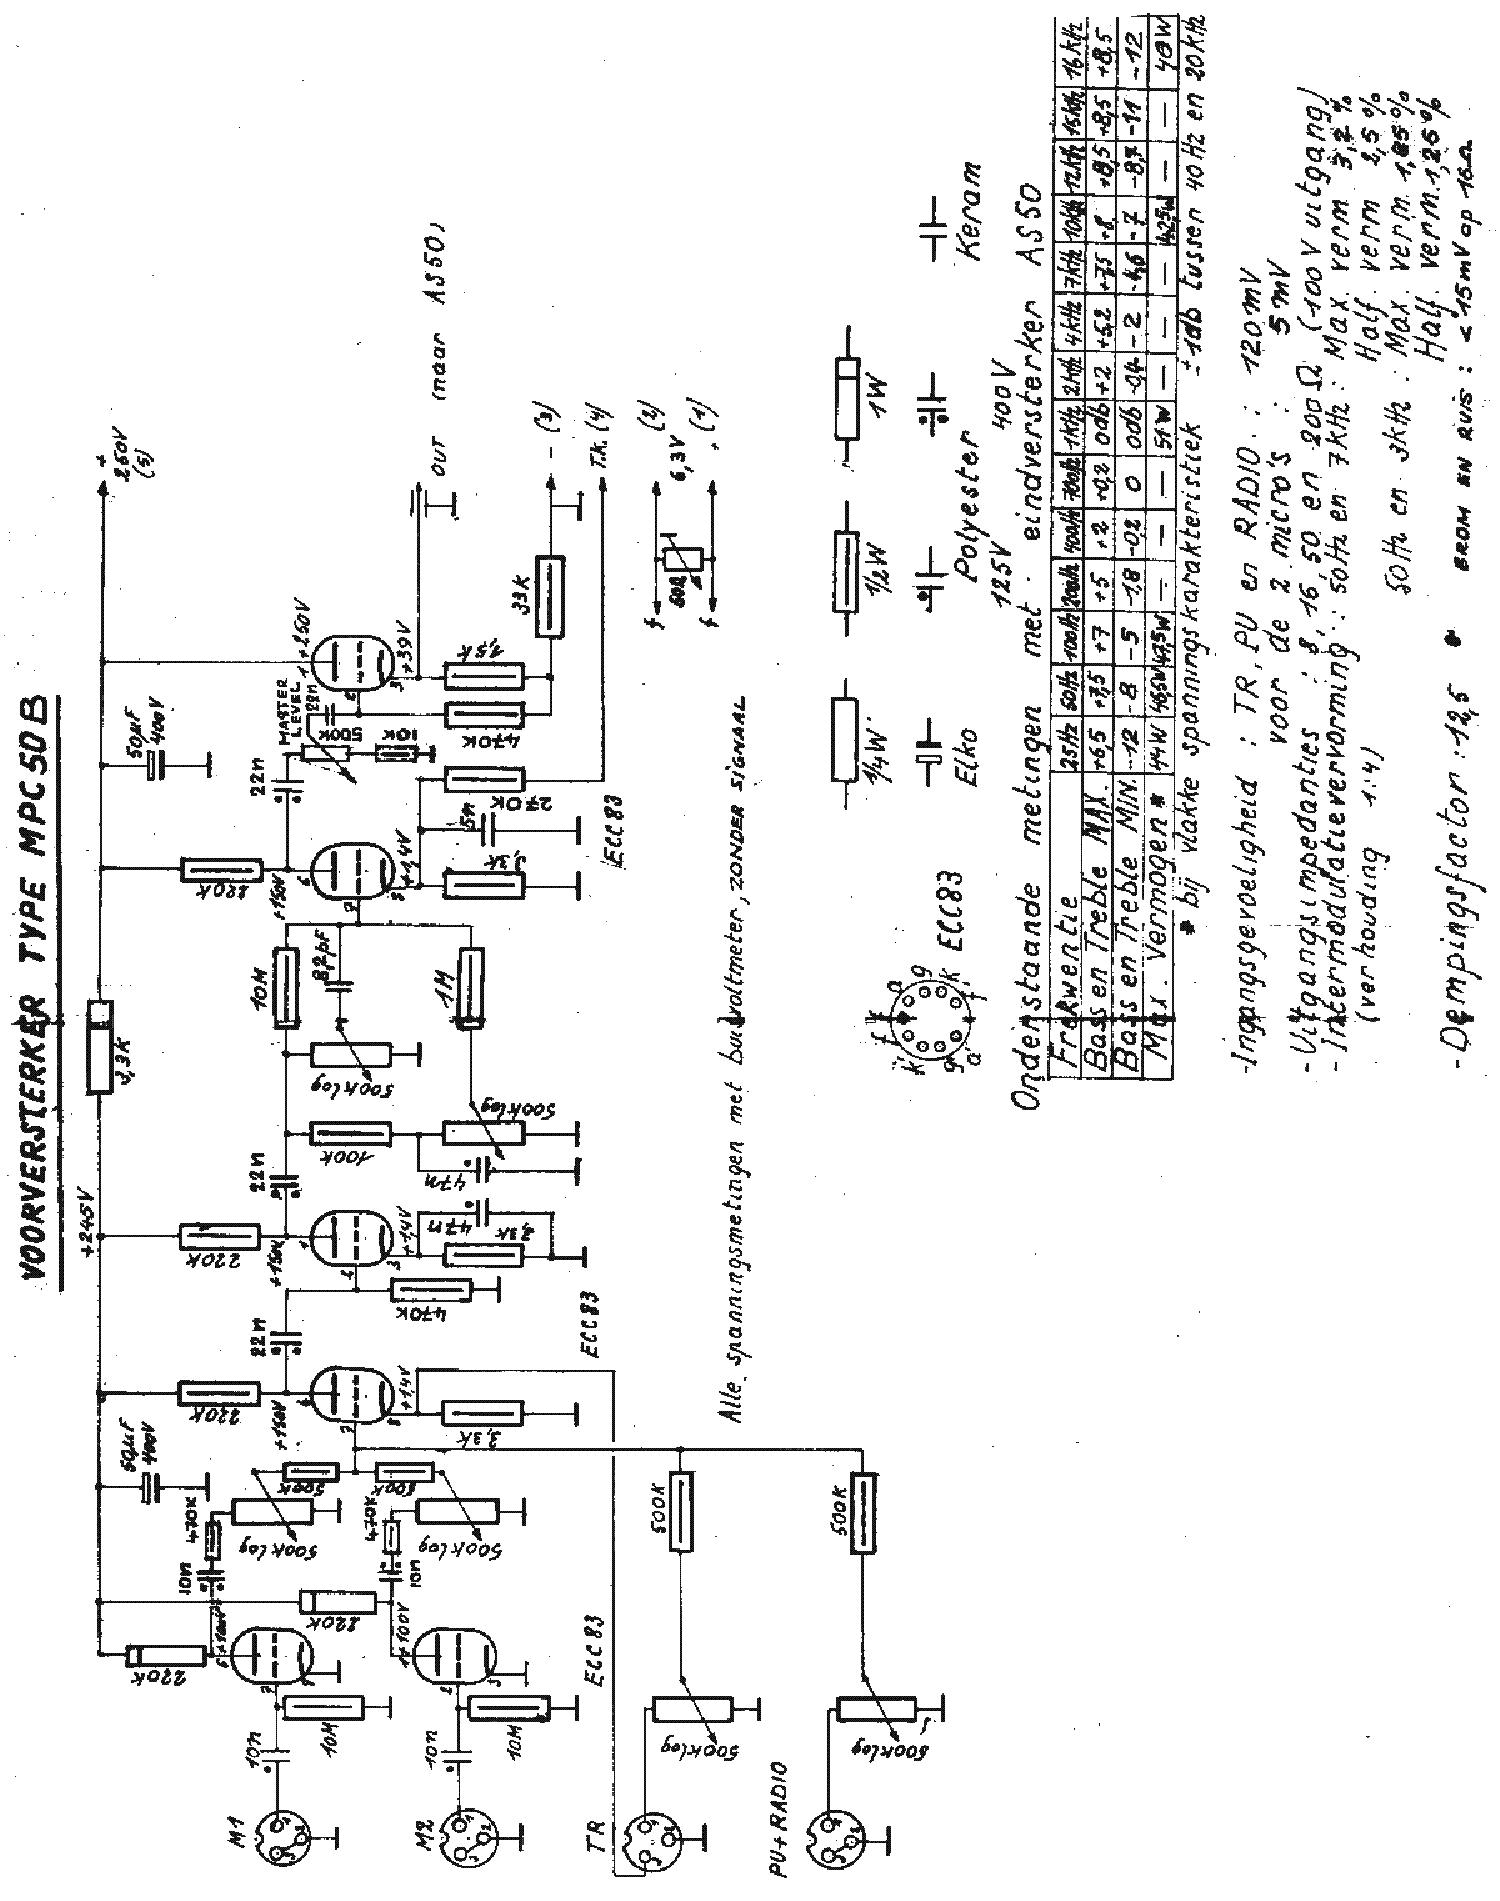 carad mpps65 stereo transistor pre amplifier 1968 sch